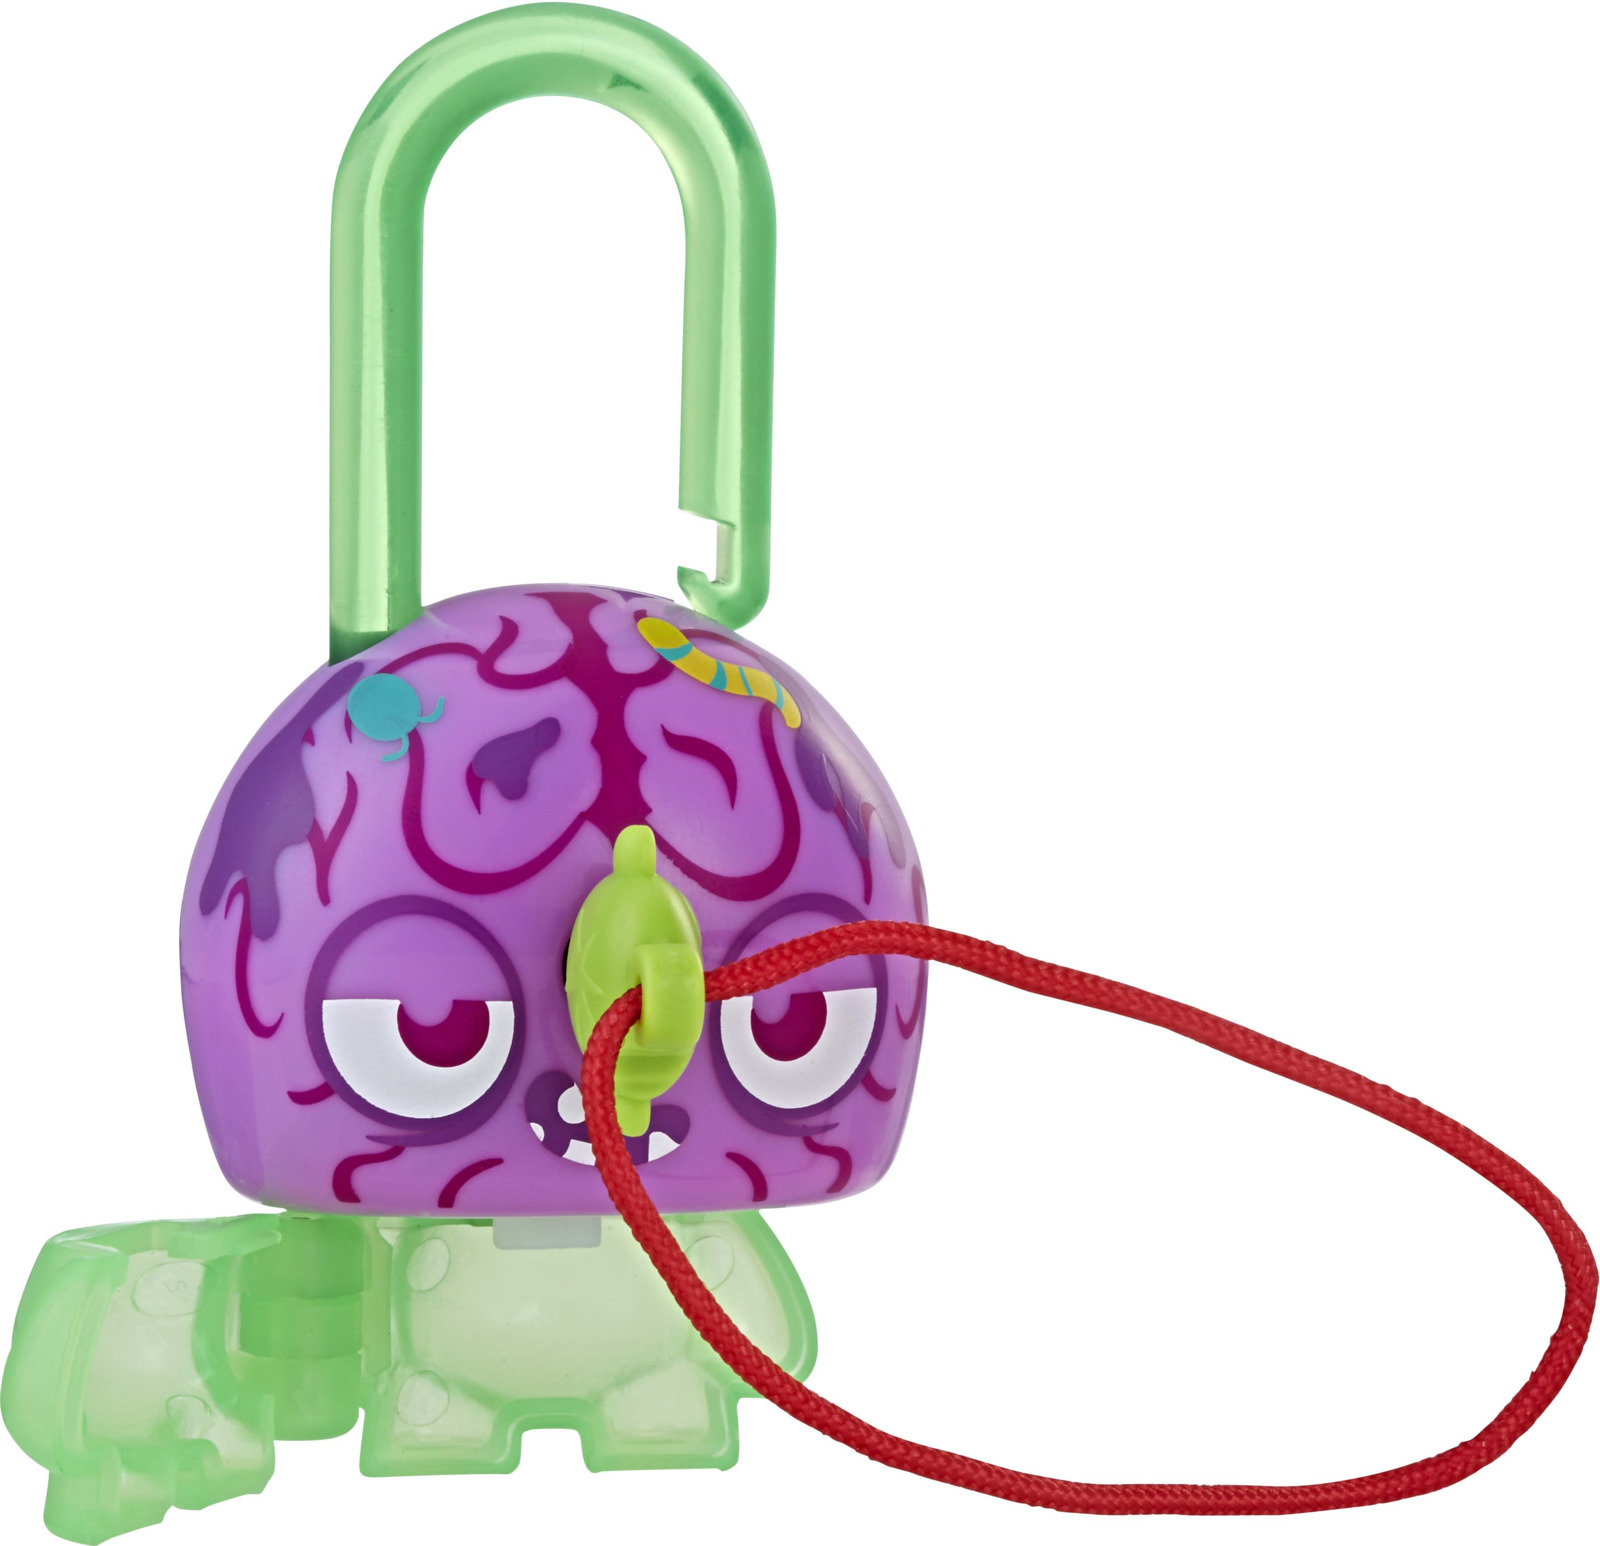 Игровой набор Lock Stars Замочки с секретом. Голова мозги бэмби бэмби бизиборд замочки деревенский двор